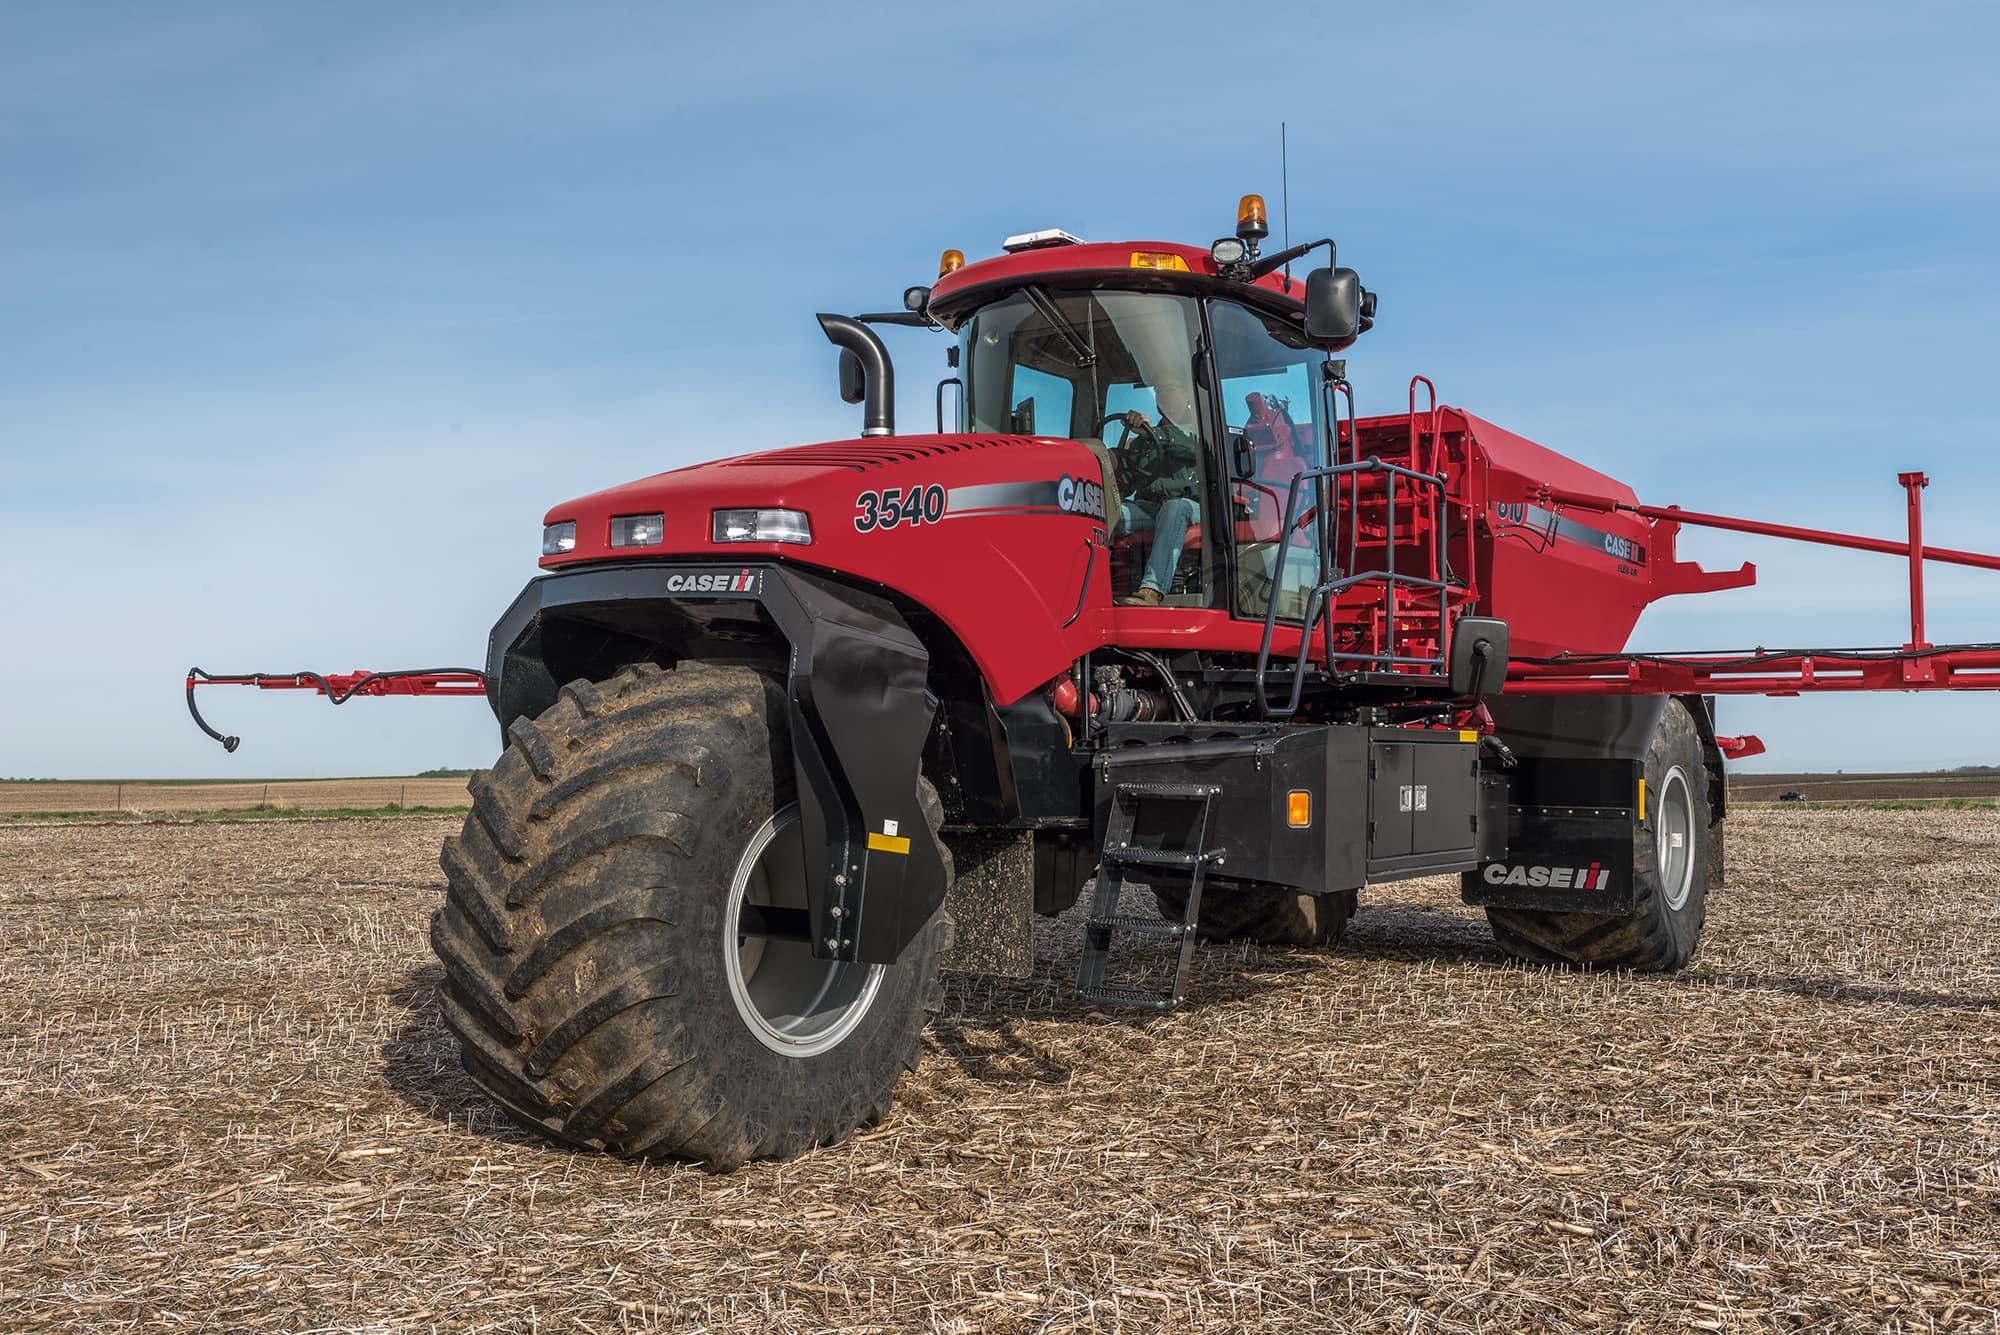 Ih 706 Wiring Diagram Trusted Schematics 656 Tractor Free Picture 3288 Reinvent Your U2022 806 International